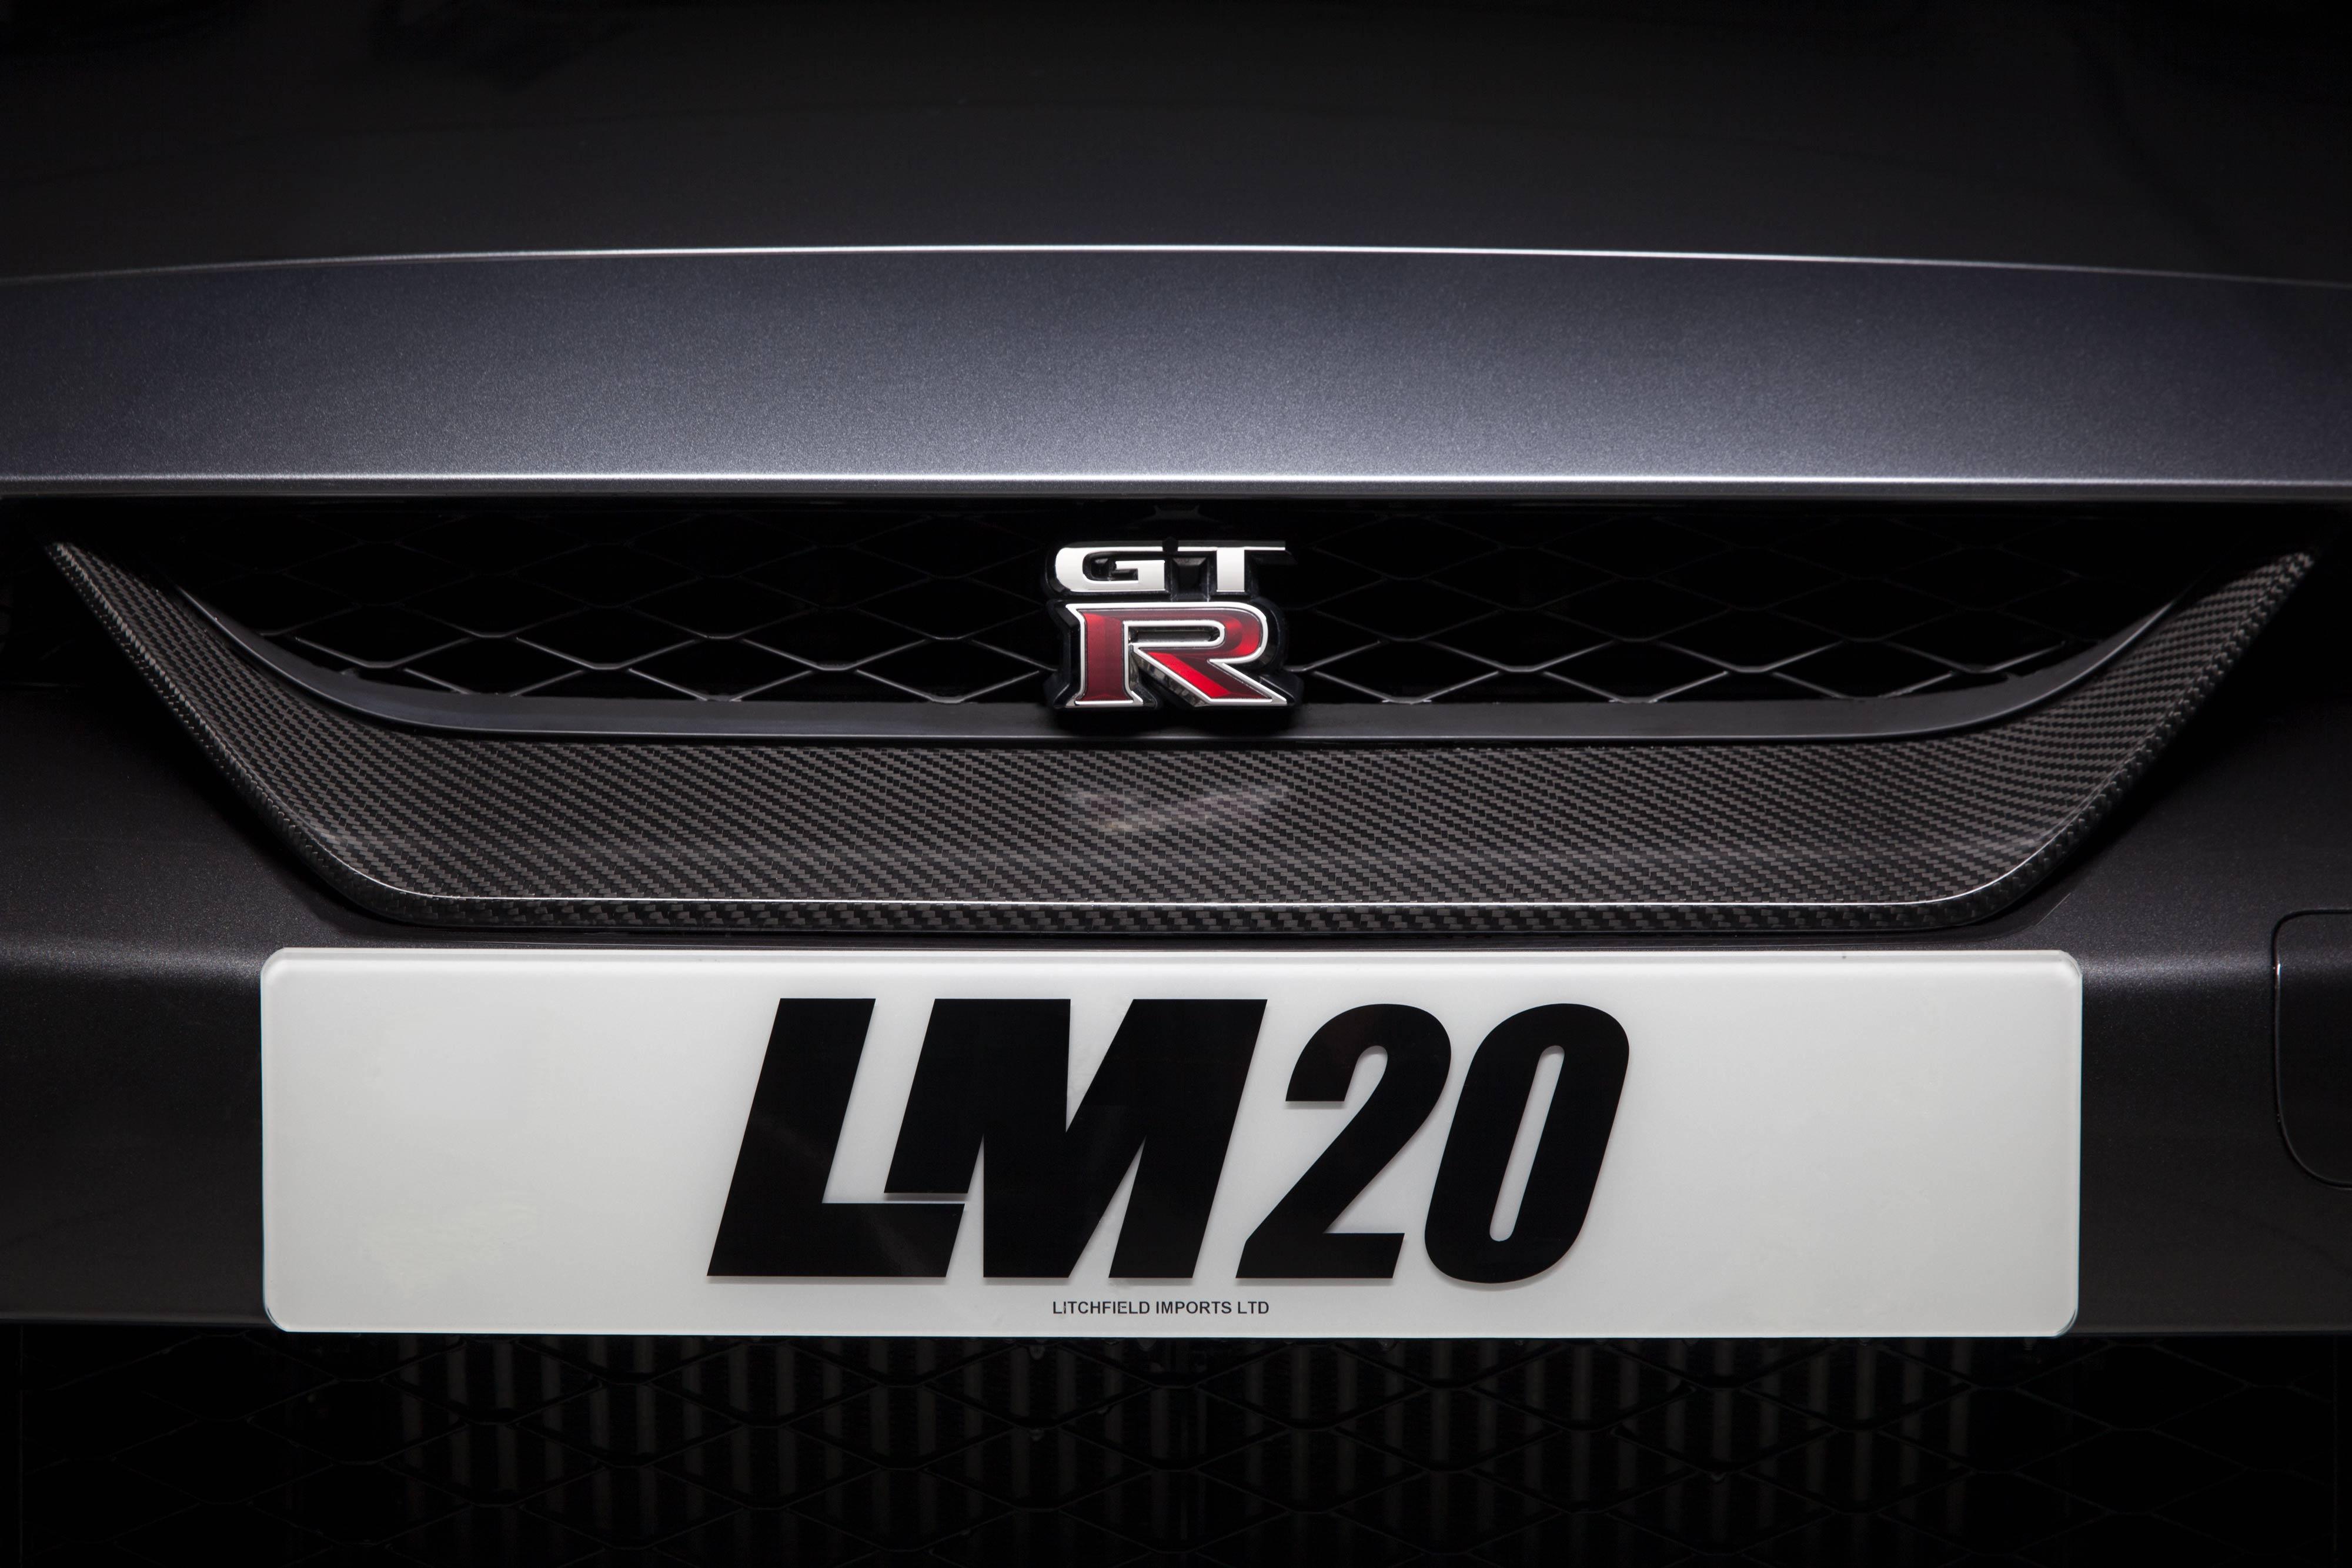 LM 20